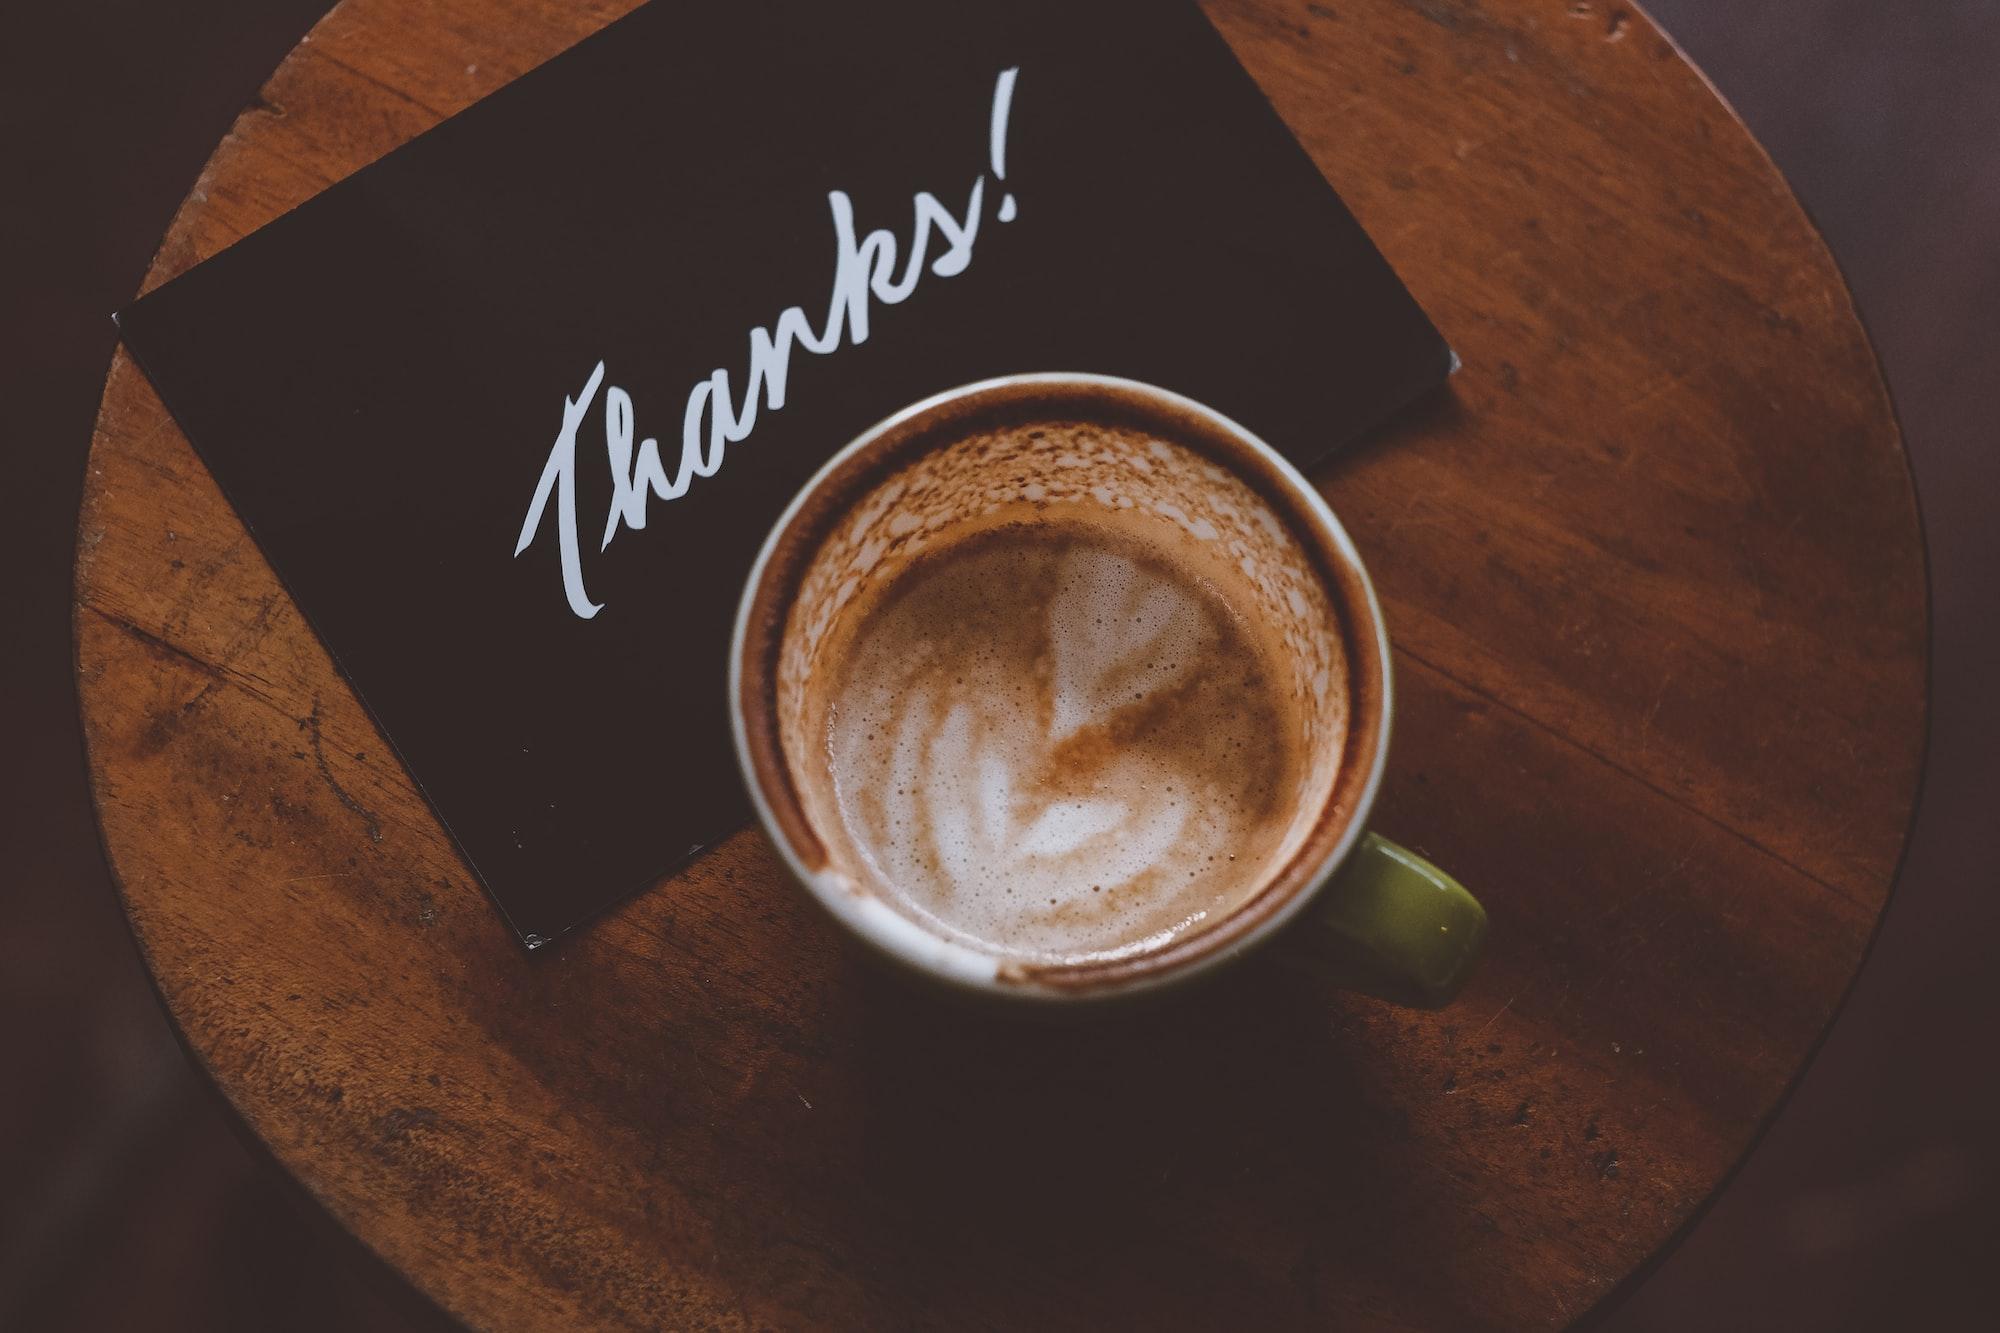 thanks postcard and latte